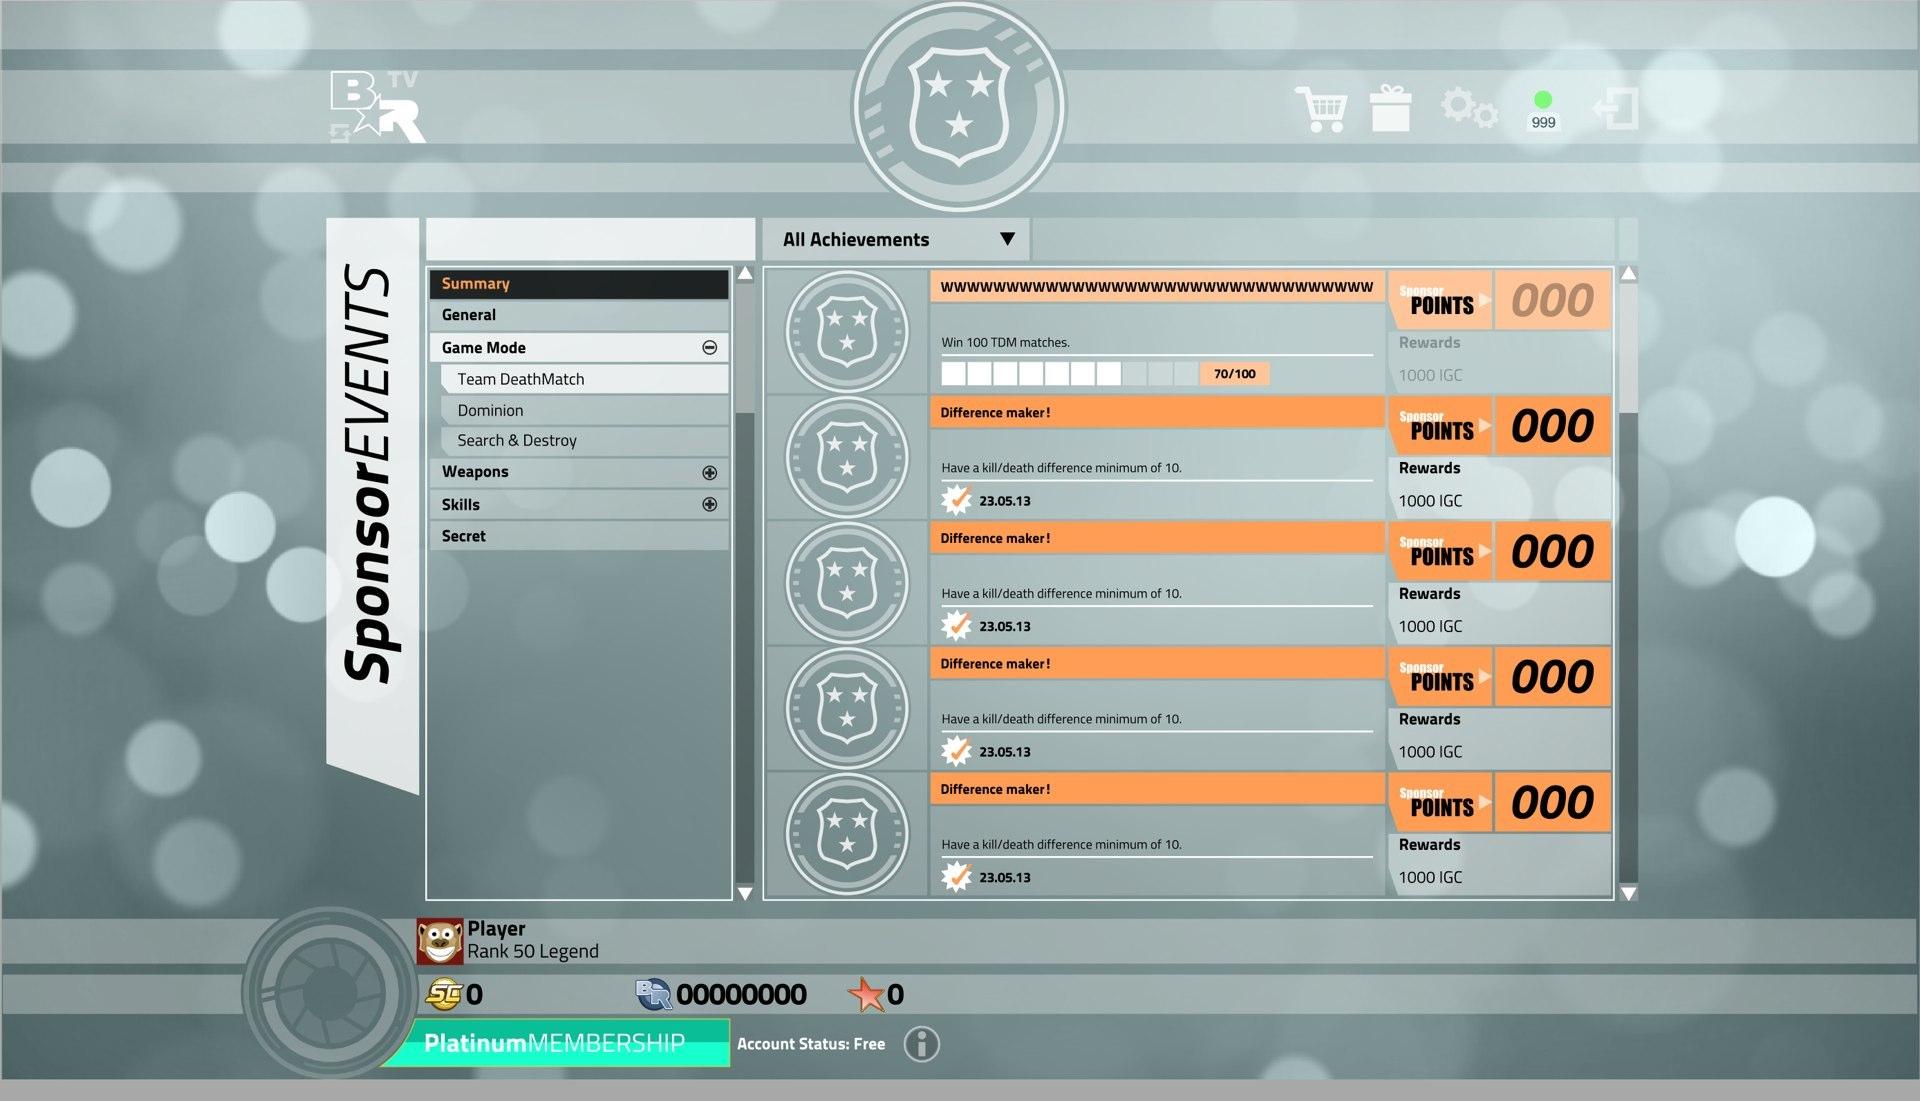 Bullet_Run_V2 Achievements Game Mode